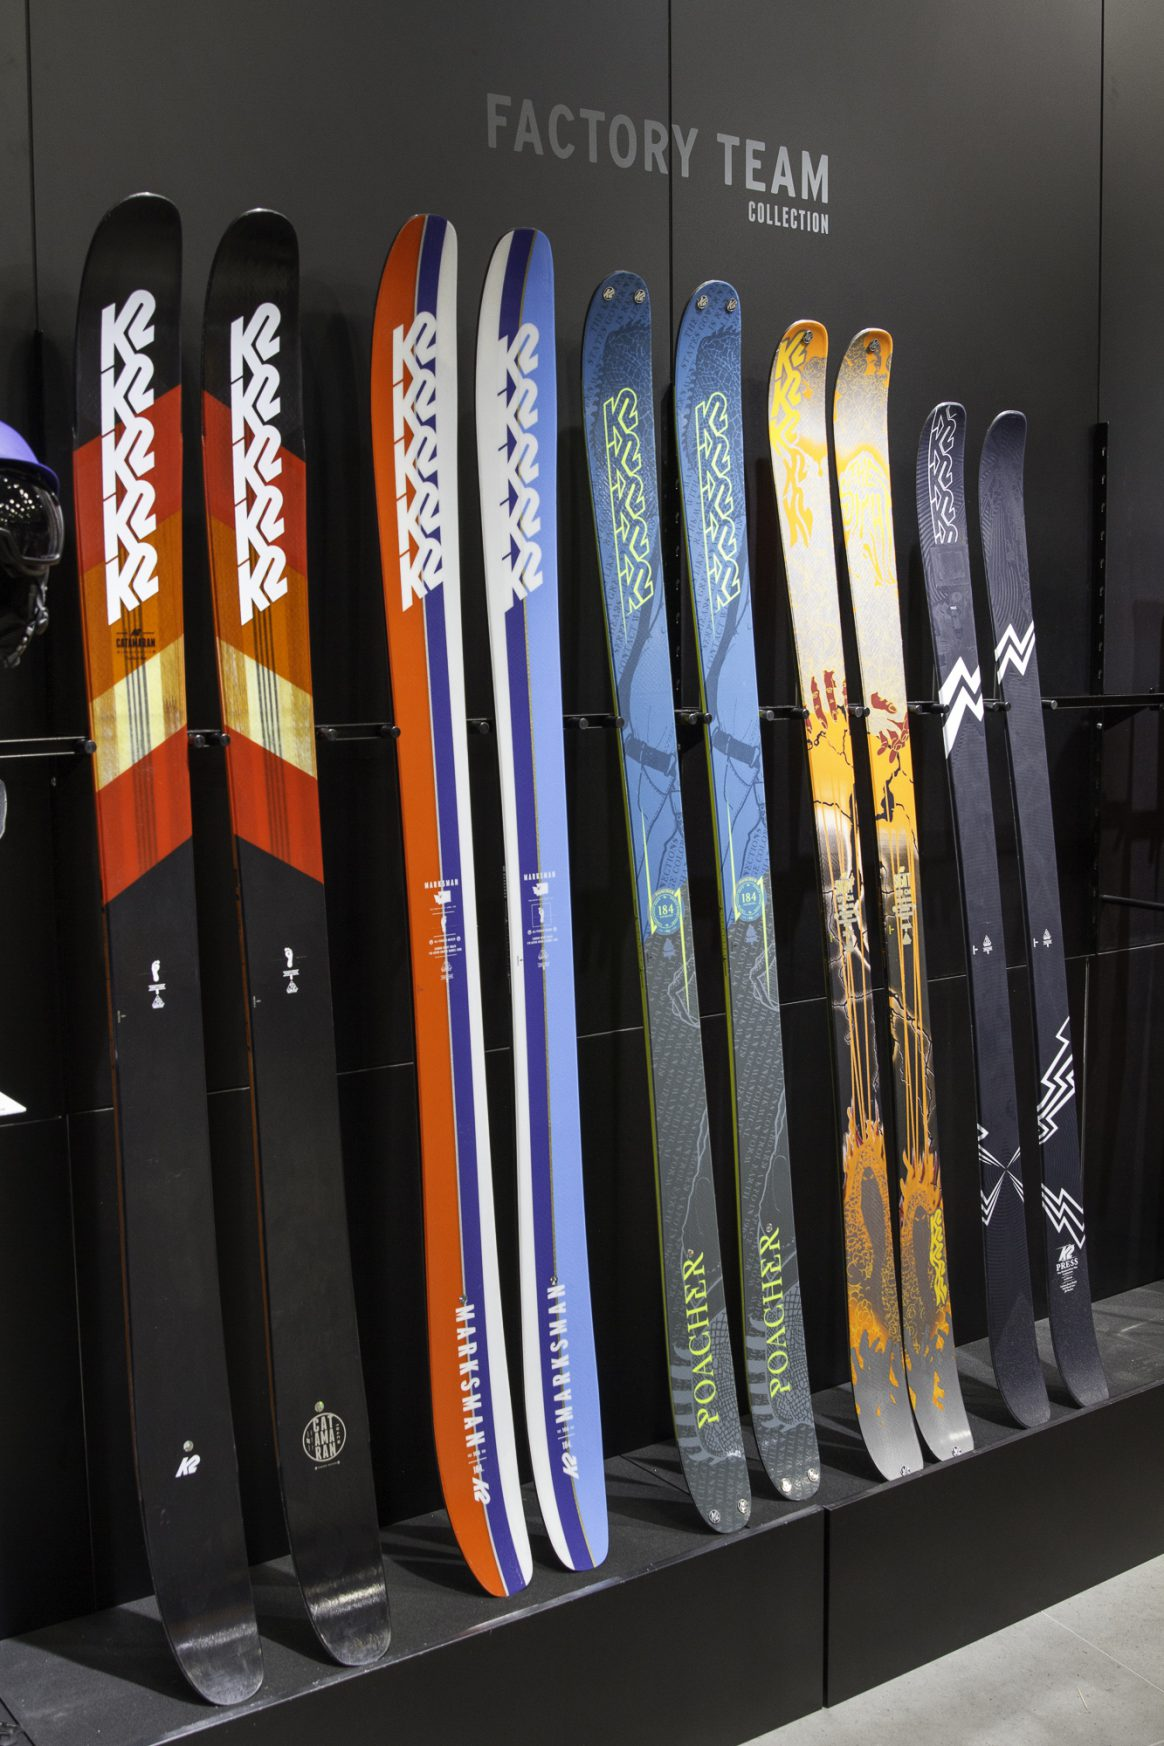 K2-FactoryTeam-Skis-3848